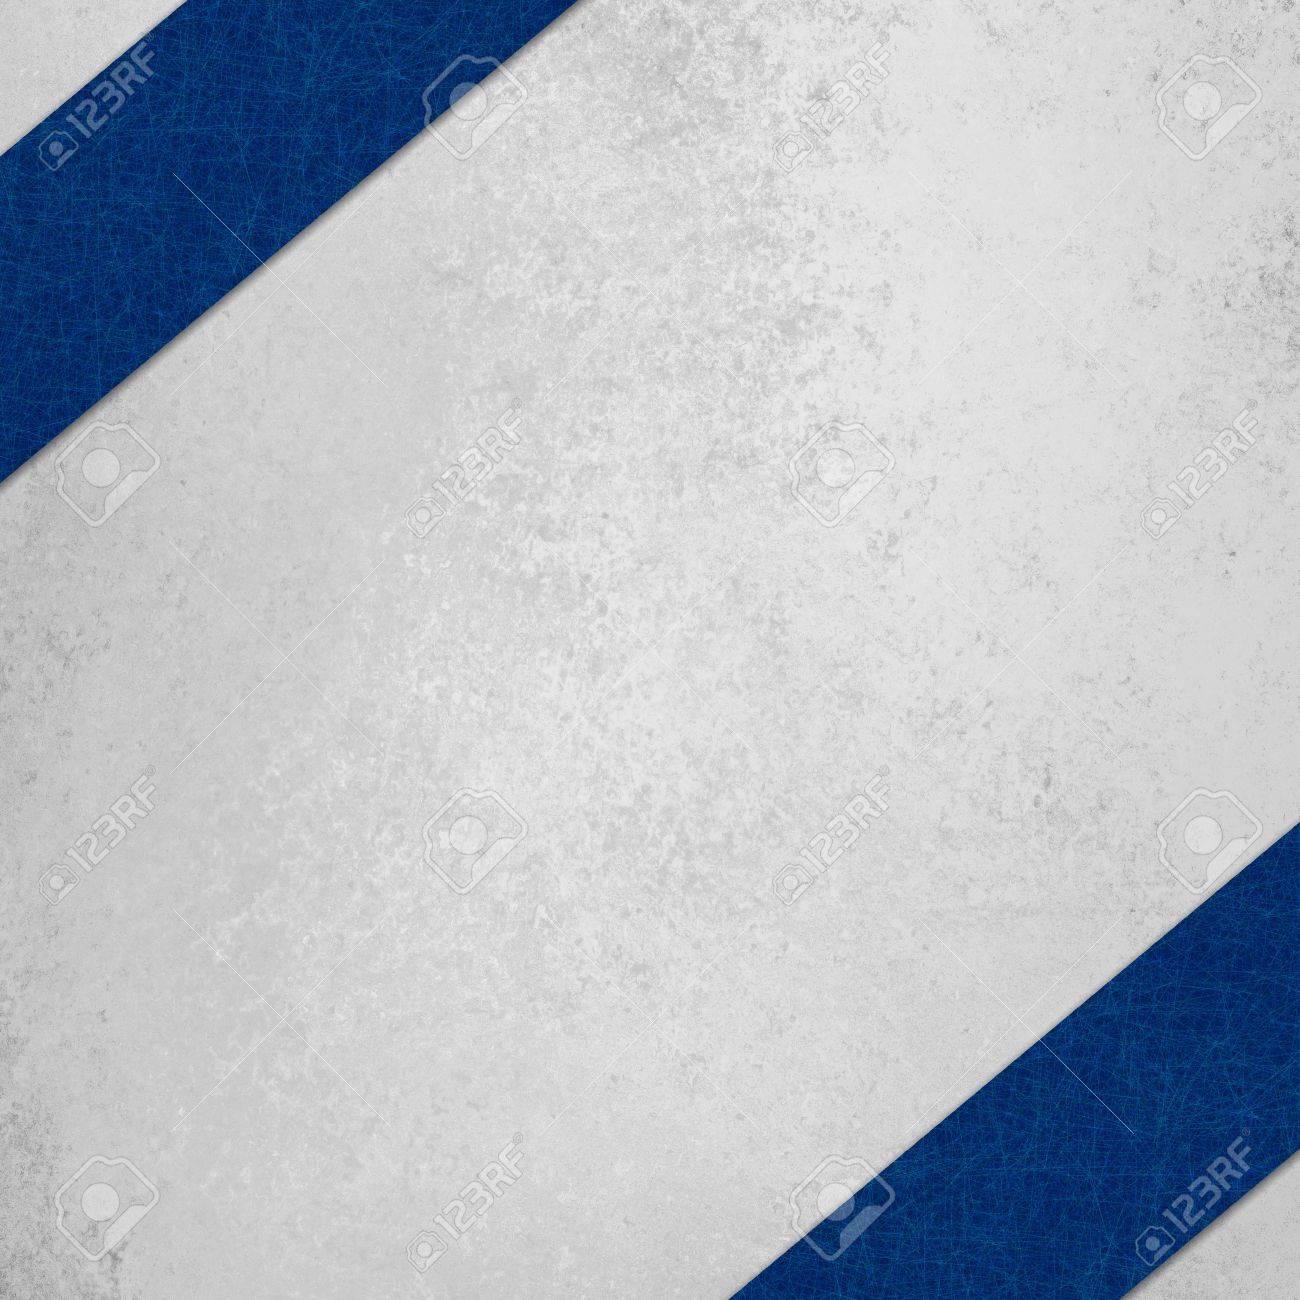 White Background With Navy Blue Diagonal Stripe In Corner Stock